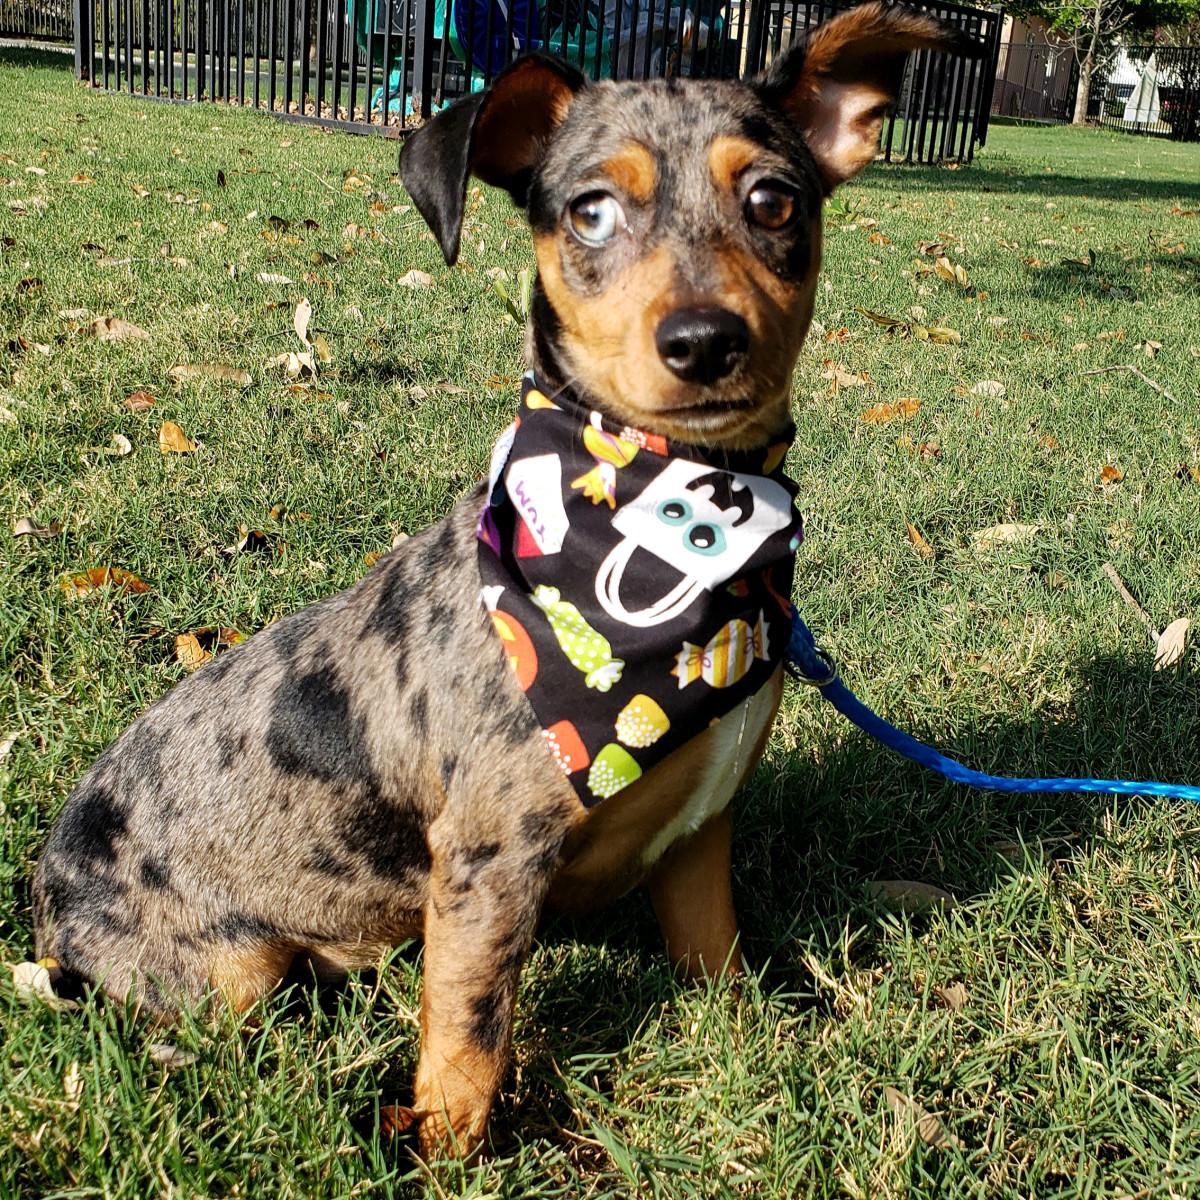 Pet of the week - Jenny dachshund mix